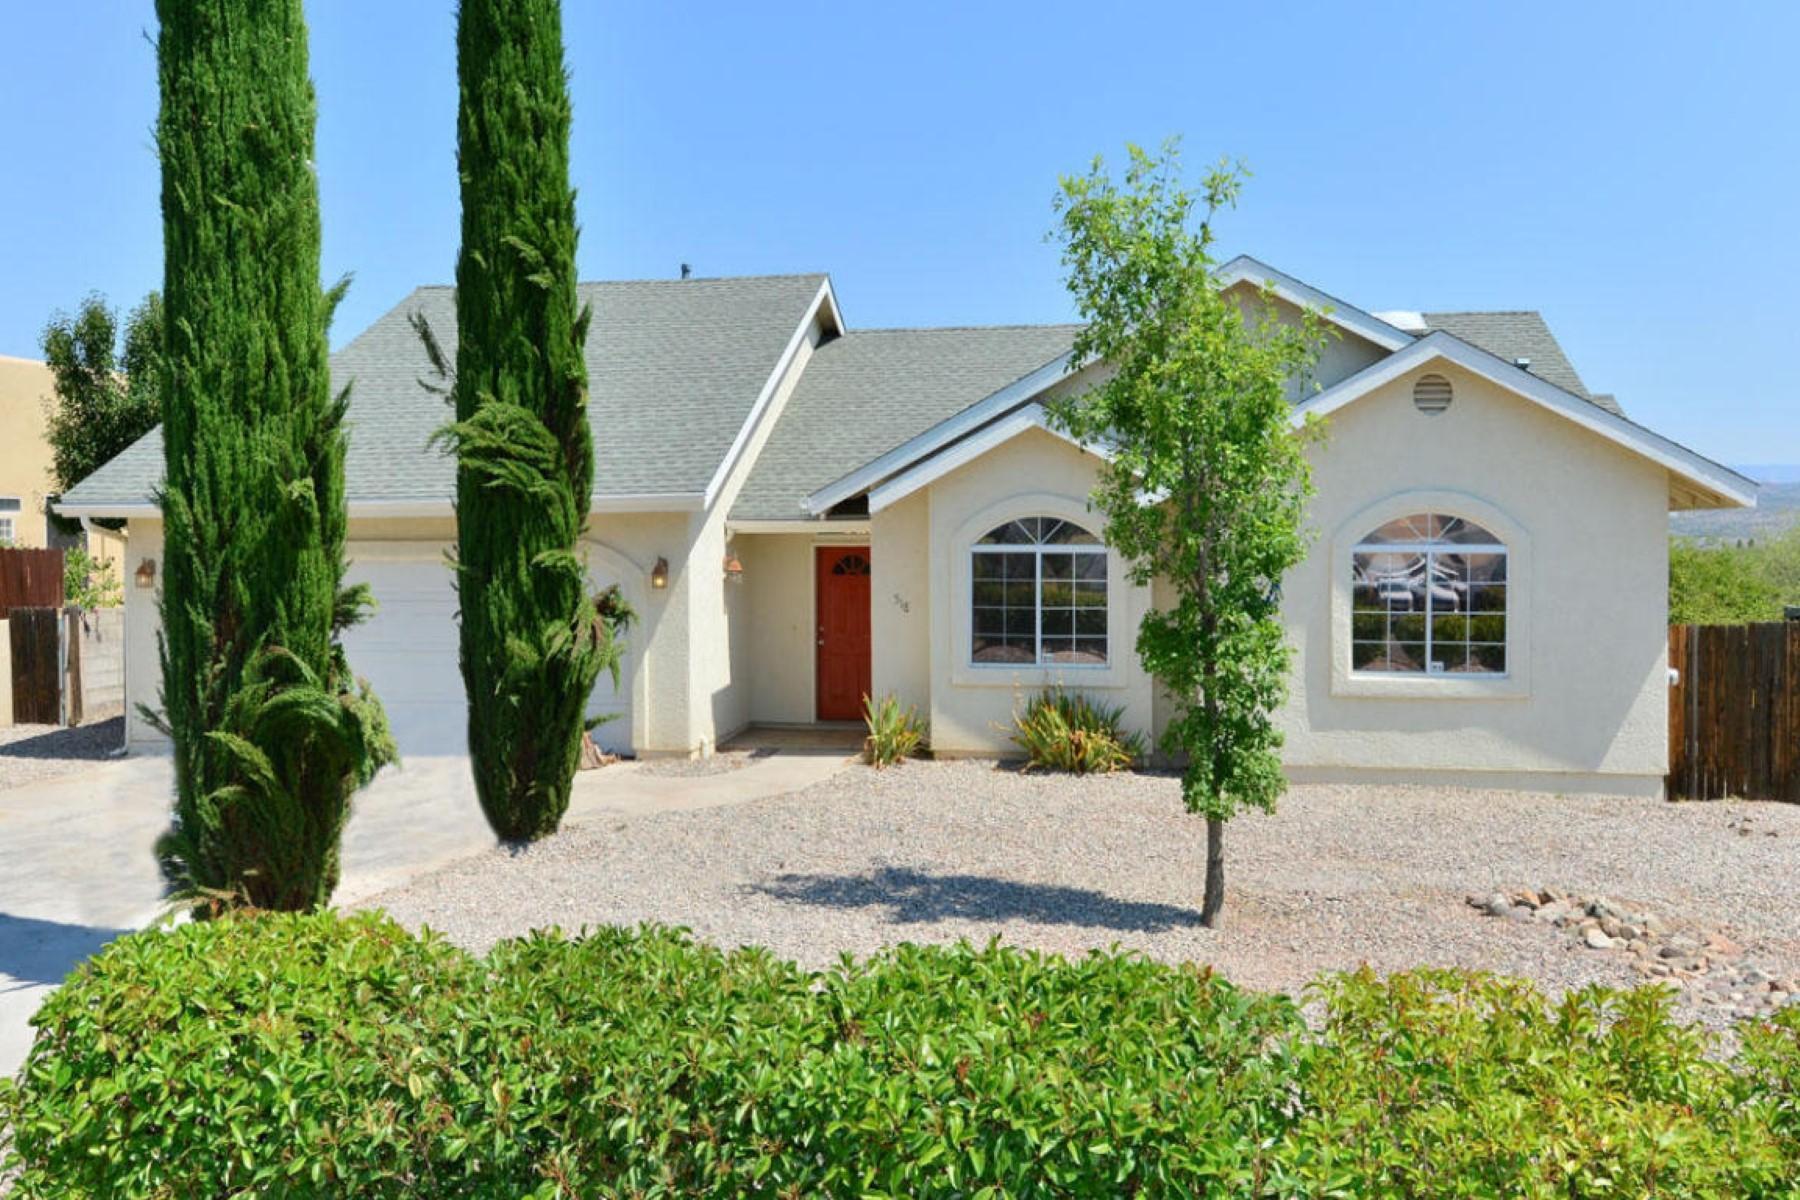 Moradia para Venda às Elegant frontyard with towering Italian Cypress bordering driveway. 518 W Mesquite Drive Cottonwood, Arizona 86326 Estados Unidos